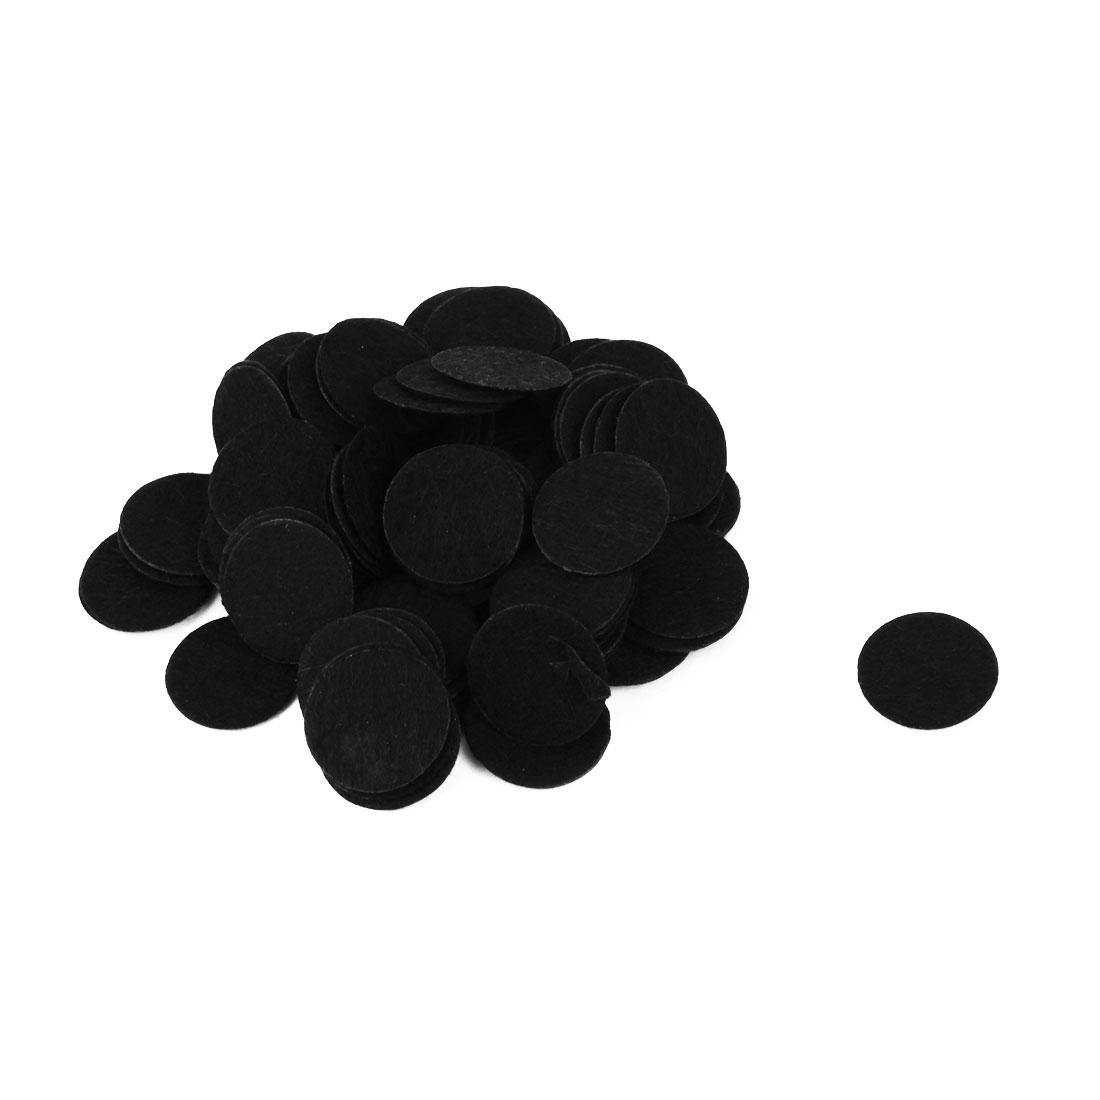 DIY Craft Accessories Hairband Hair Clip Circle Pad Black 20mm Diameter 100pcs